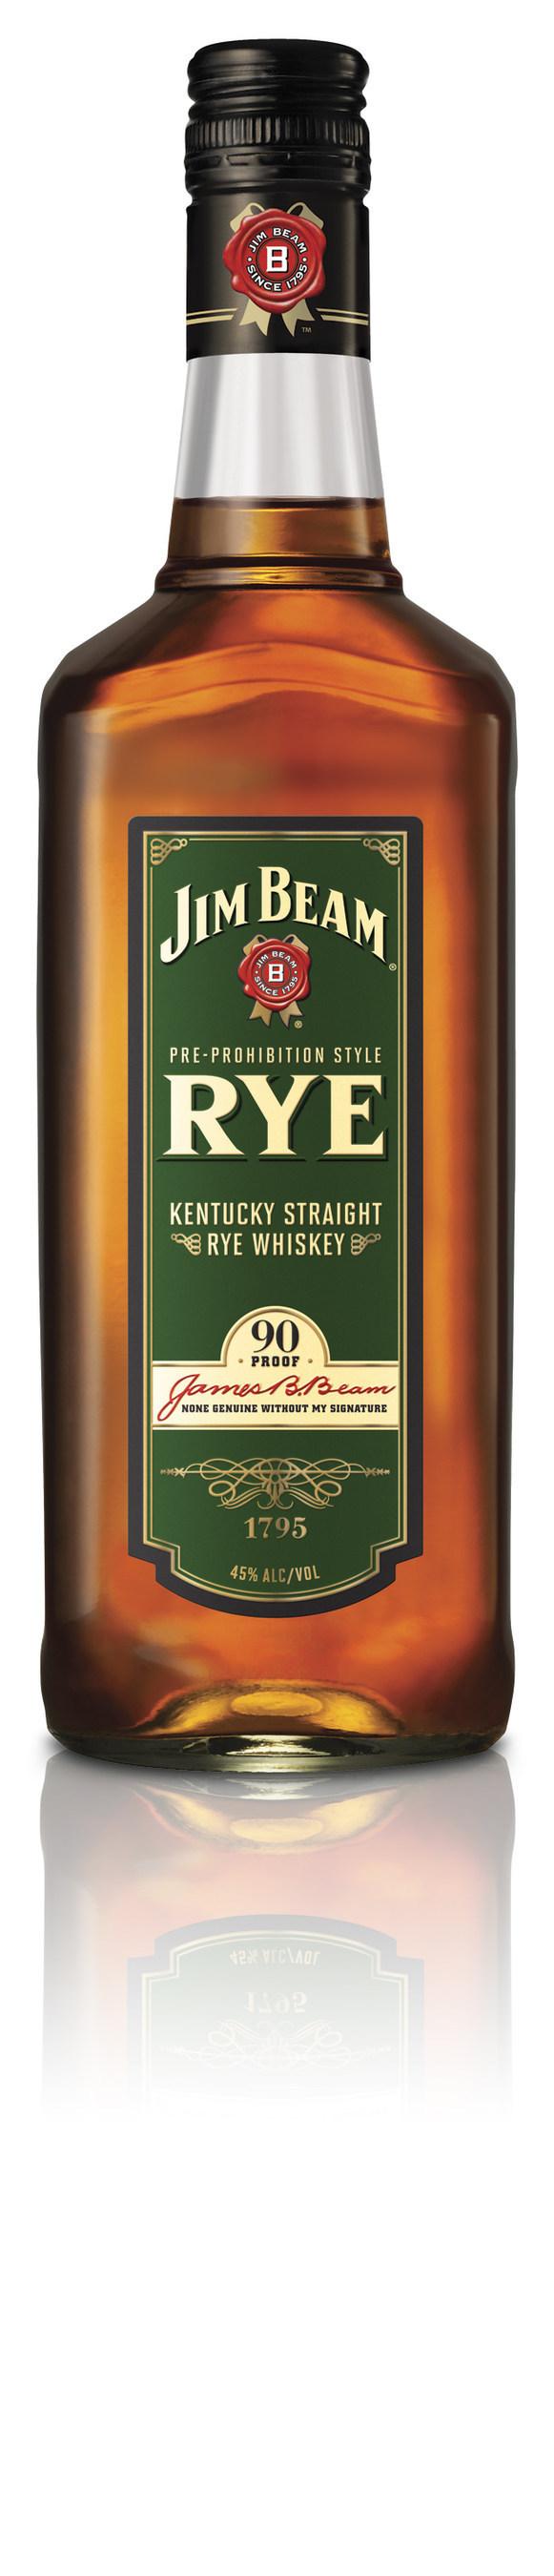 Jim Beam Releases New Premium Take On Rye Whiskey Staple